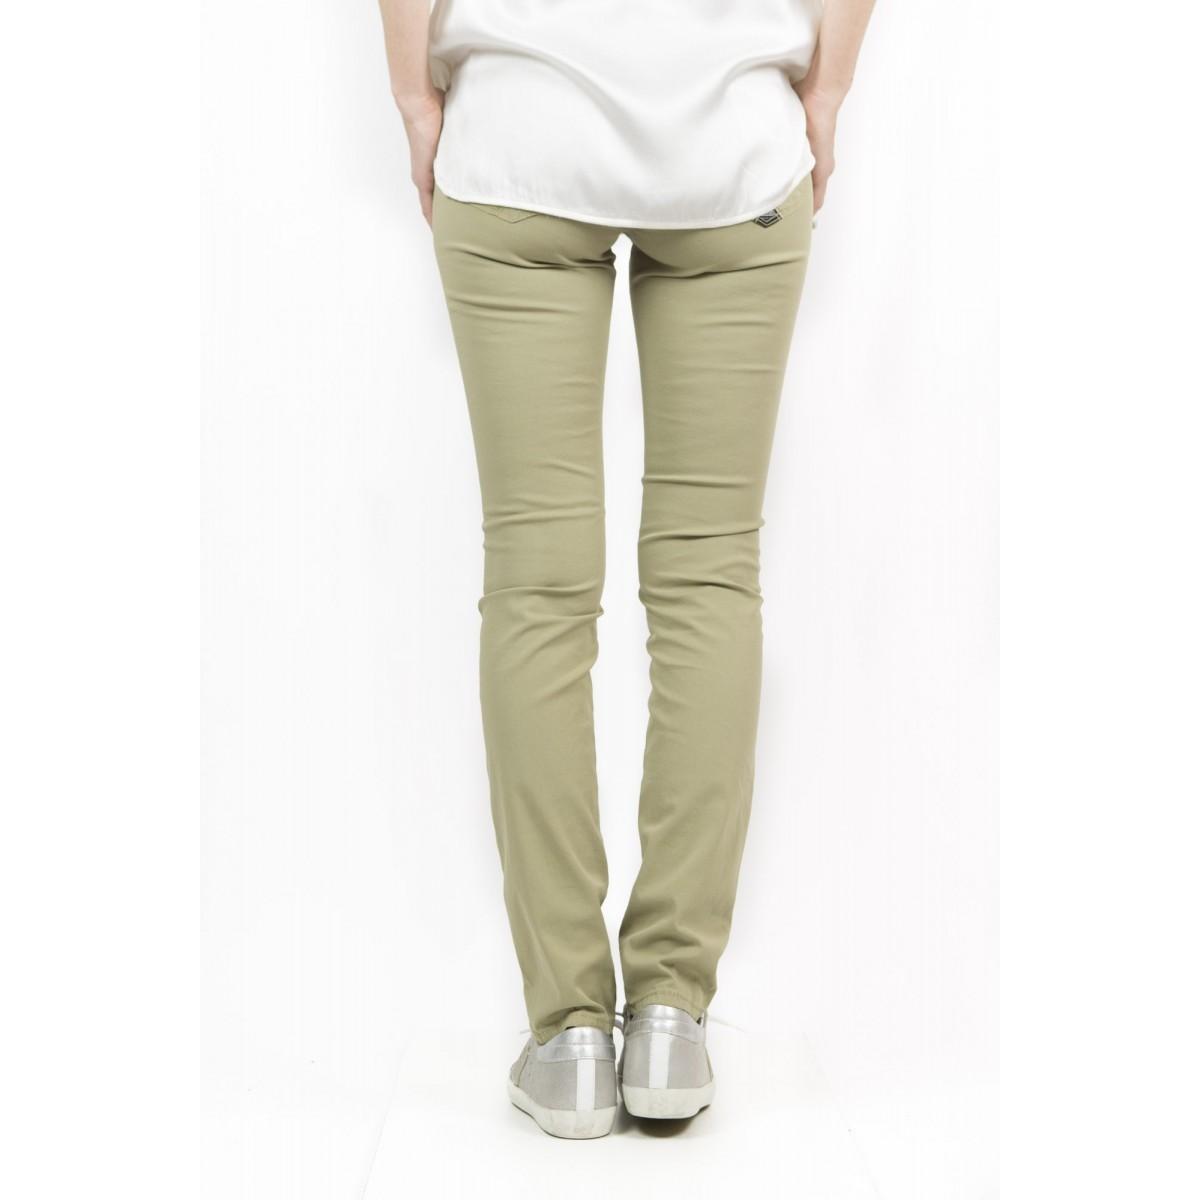 Pantalone donna Roy rogers - Cate gabardina summer strech 081 - kaky